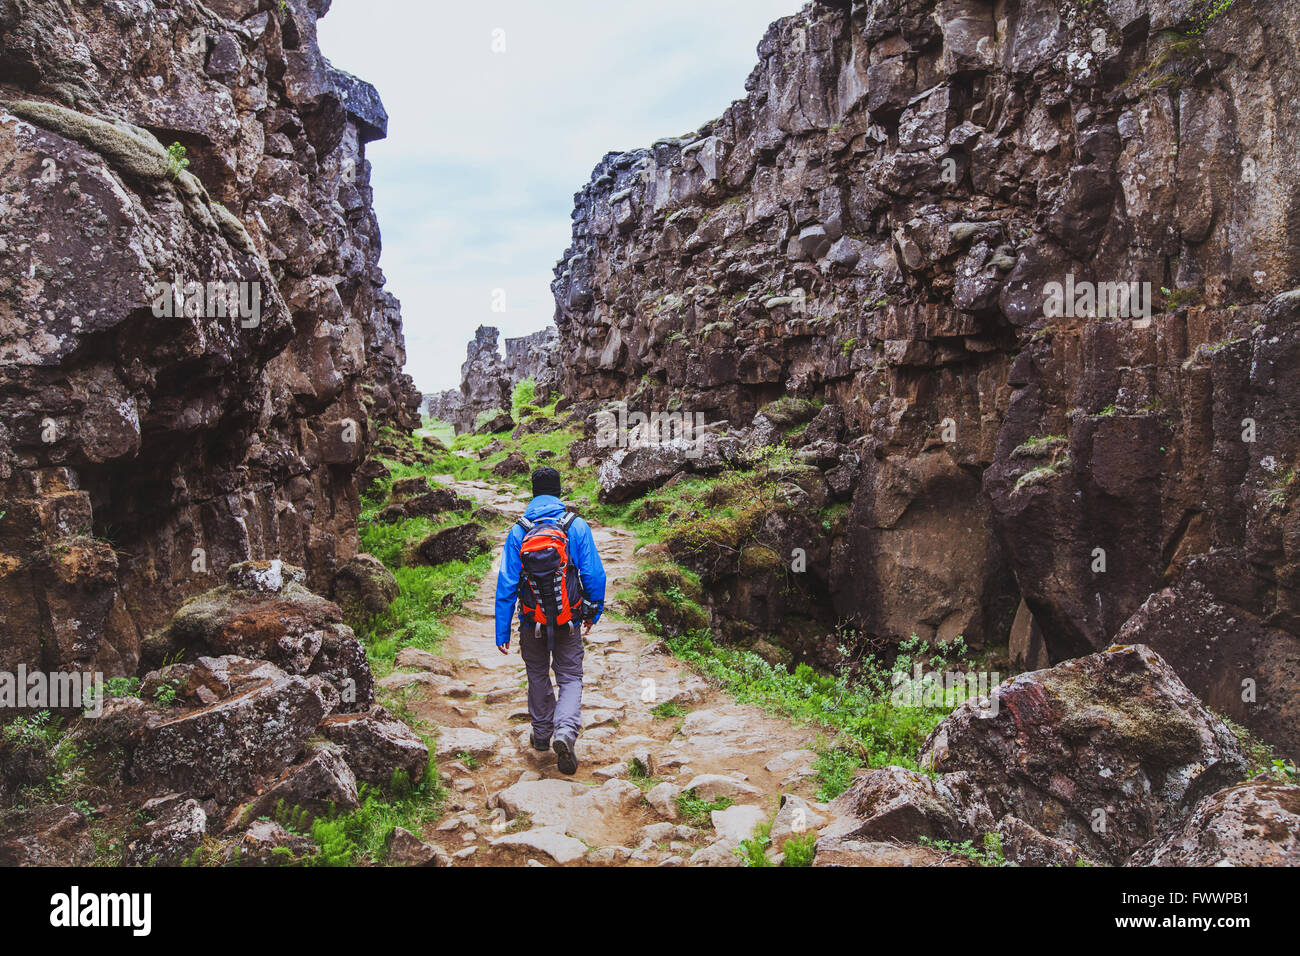 Wandern in felsige Schlucht, Backpacker, lange Spaziergänge in der Natur, Island Stockbild